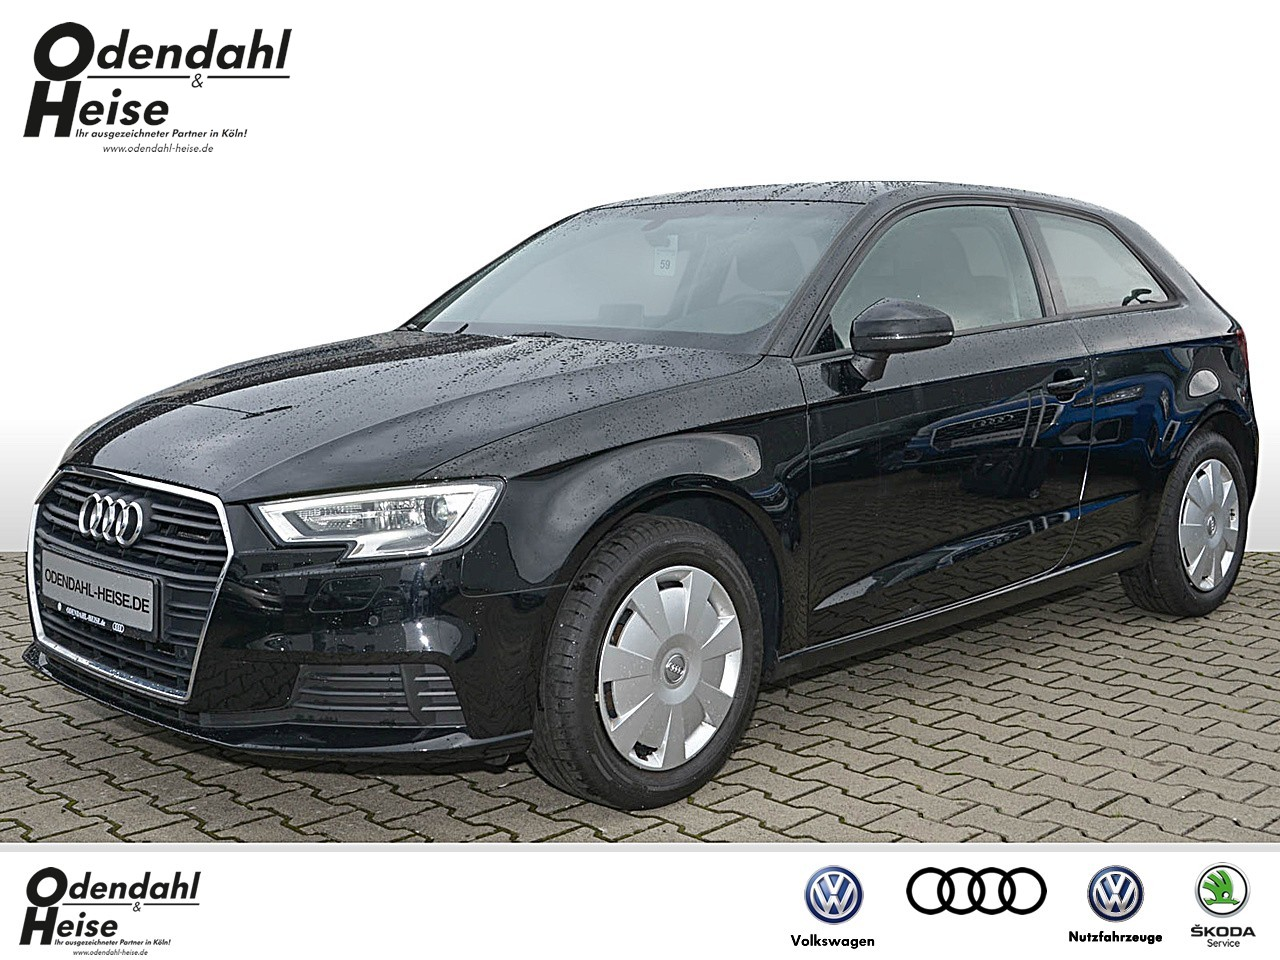 Audi A3 2.0 TDI EU6 Klima Xenon Navi Einparkhilfe, Jahr 2017, Diesel